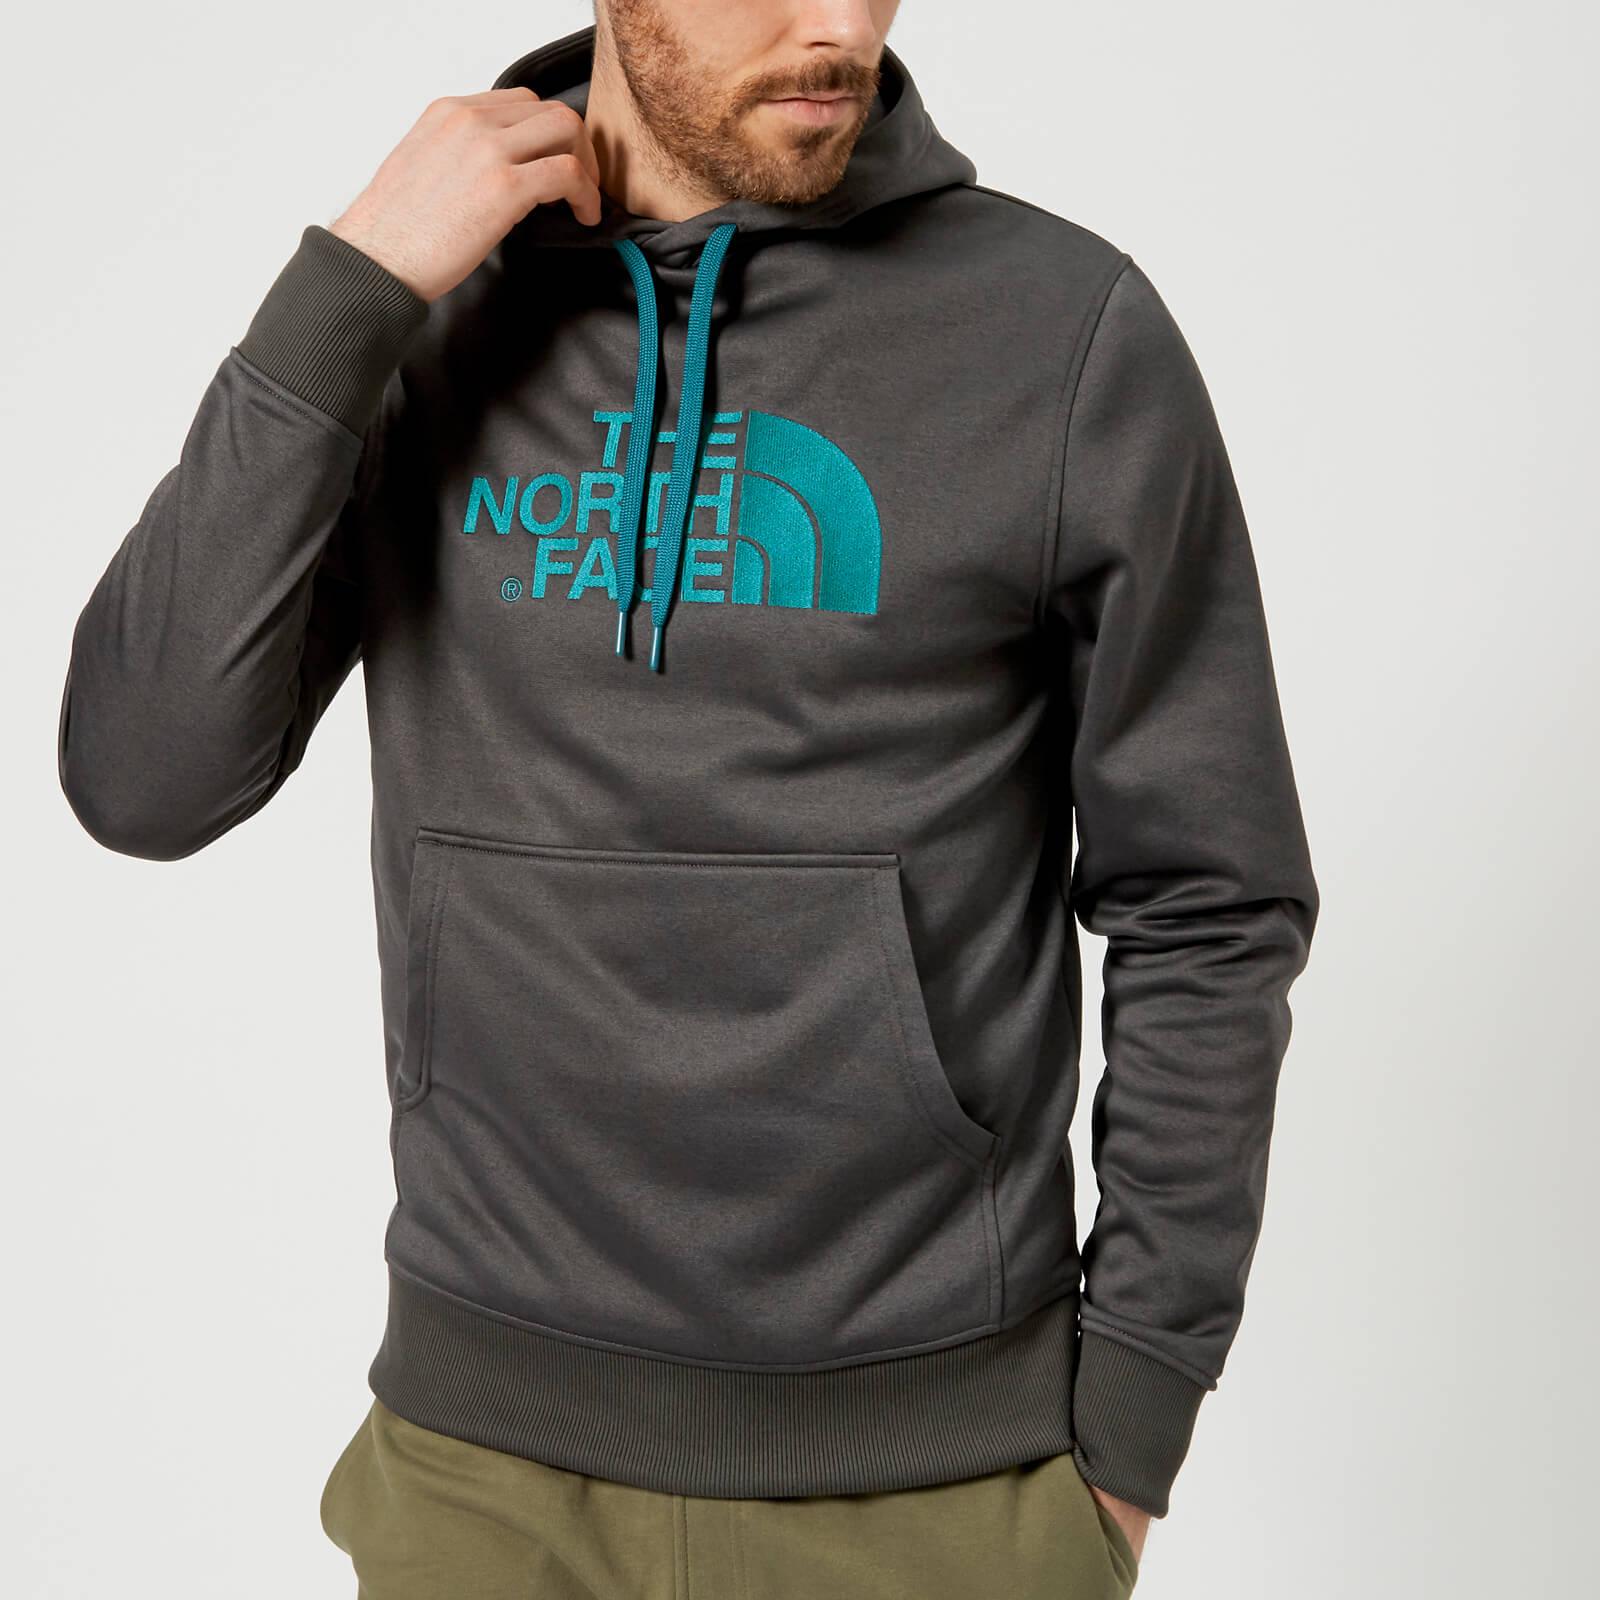 d162a9d09763 The North Face Men s Mc Drew Peak Hoodie - Asphalt Grey Dark Heather Mens  Clothing